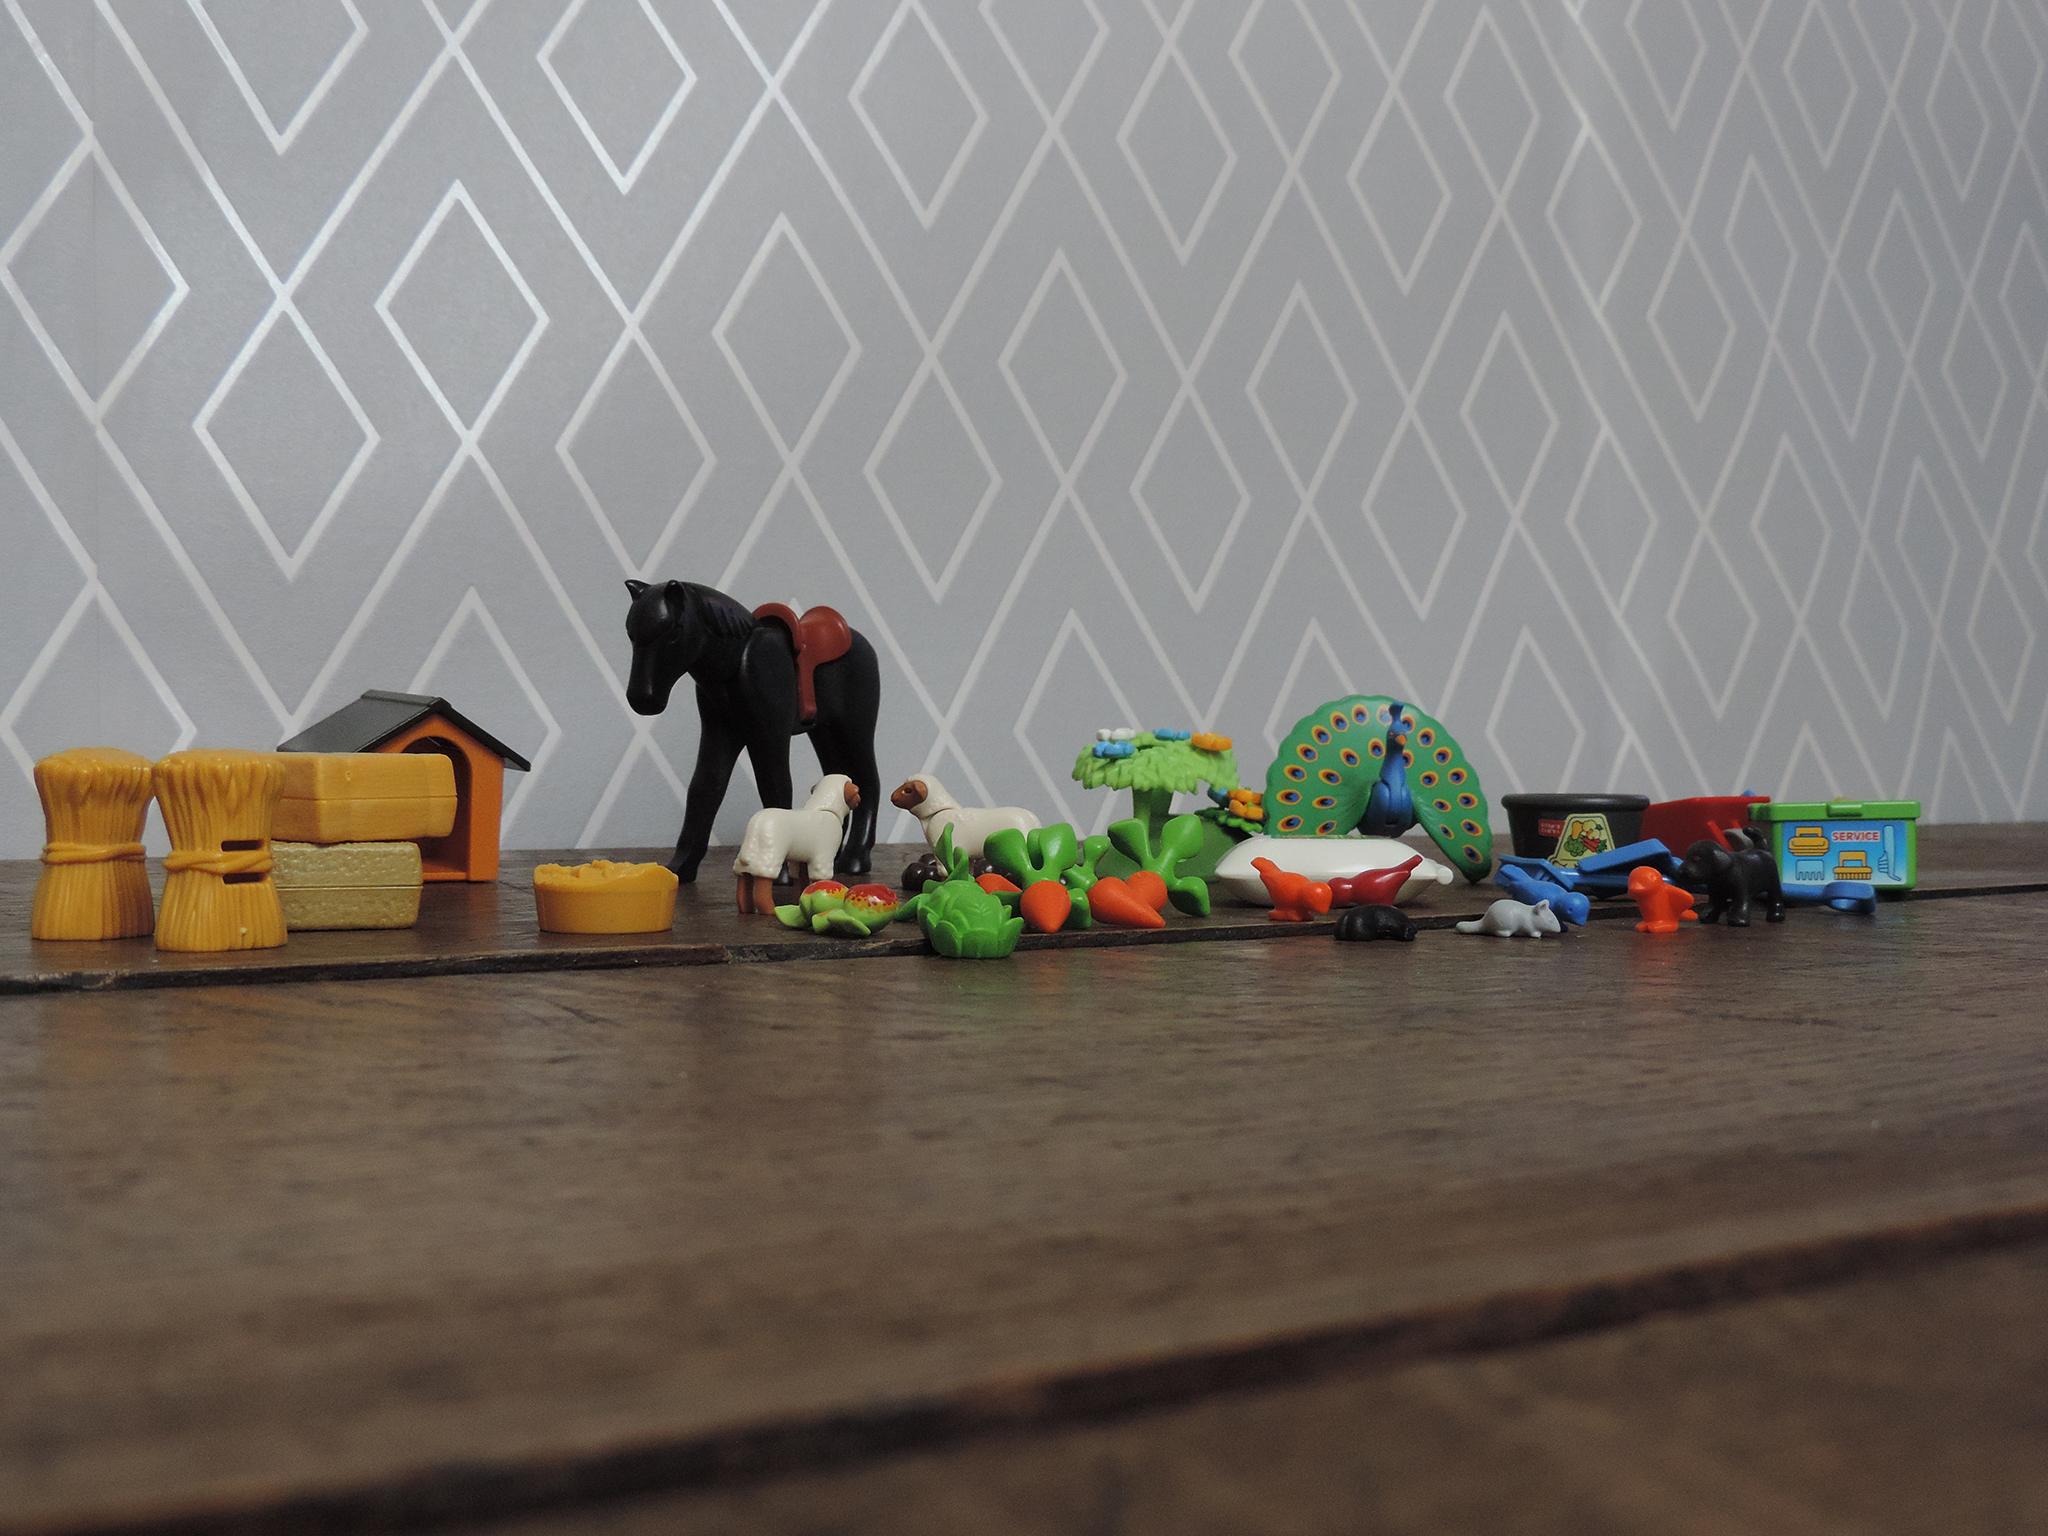 Animaux Playmobil ref 197